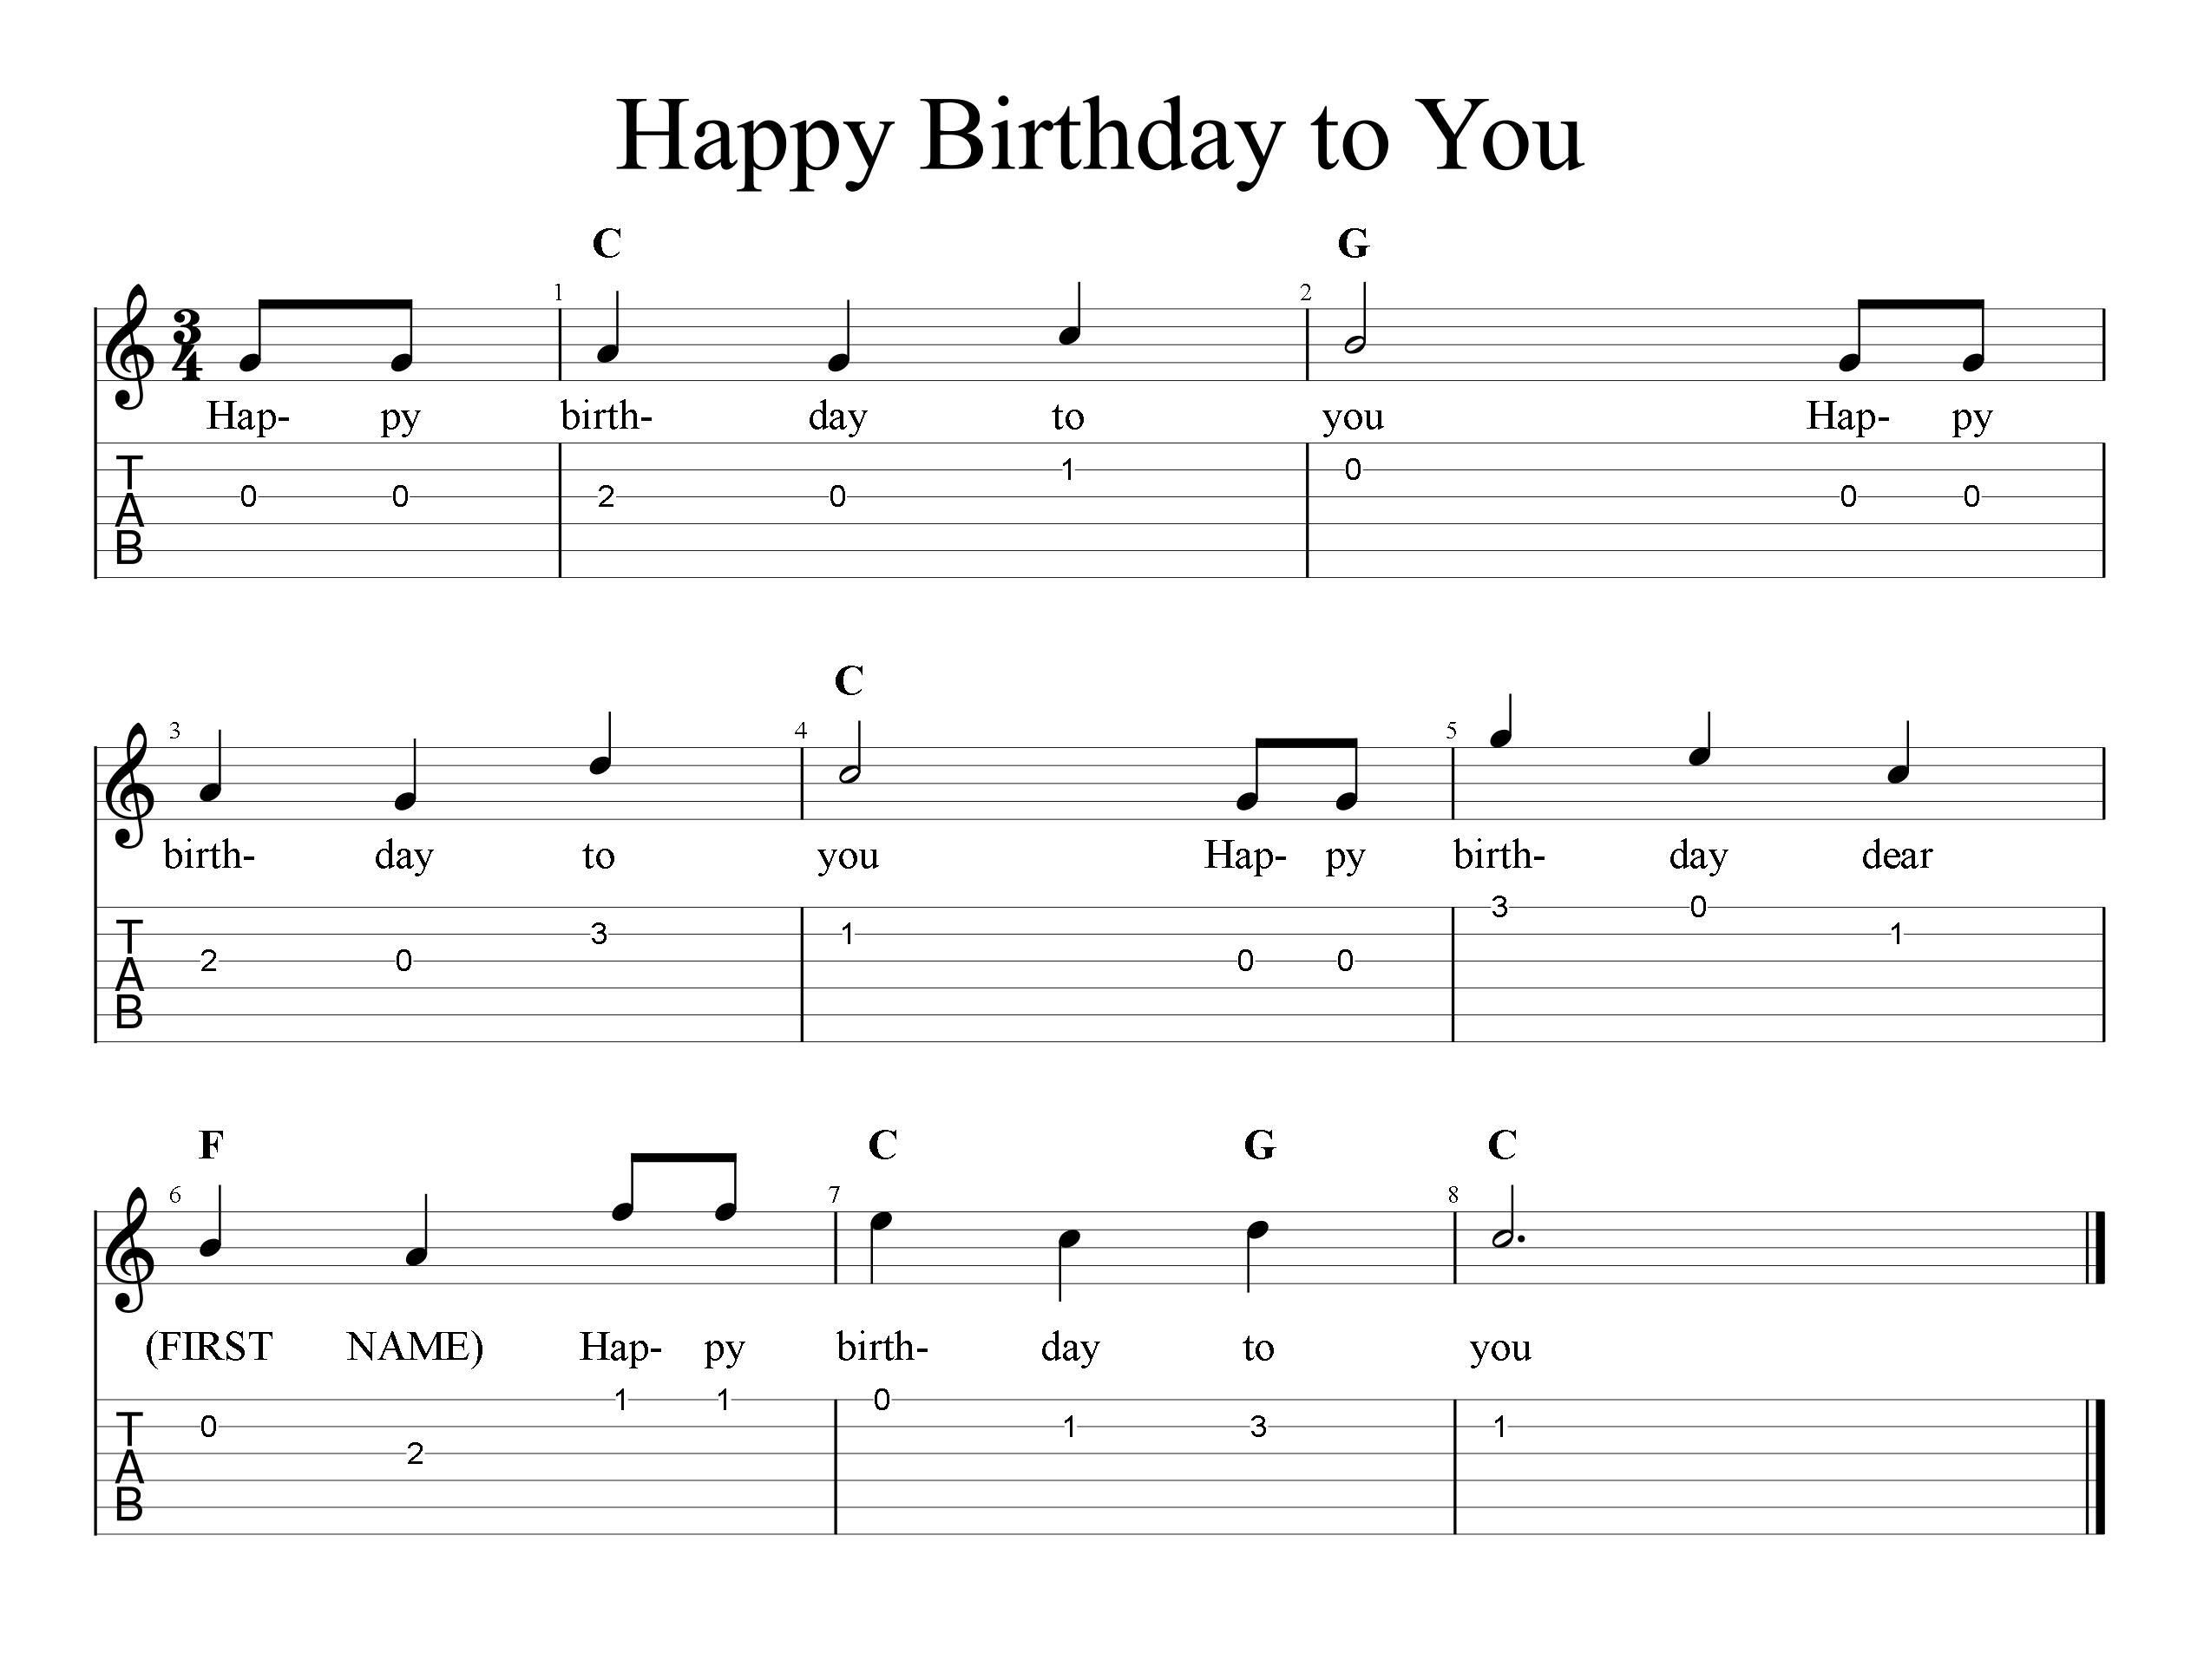 Happy Birthday - Tab & Sheet Music | FreeWheelinGuitar.com